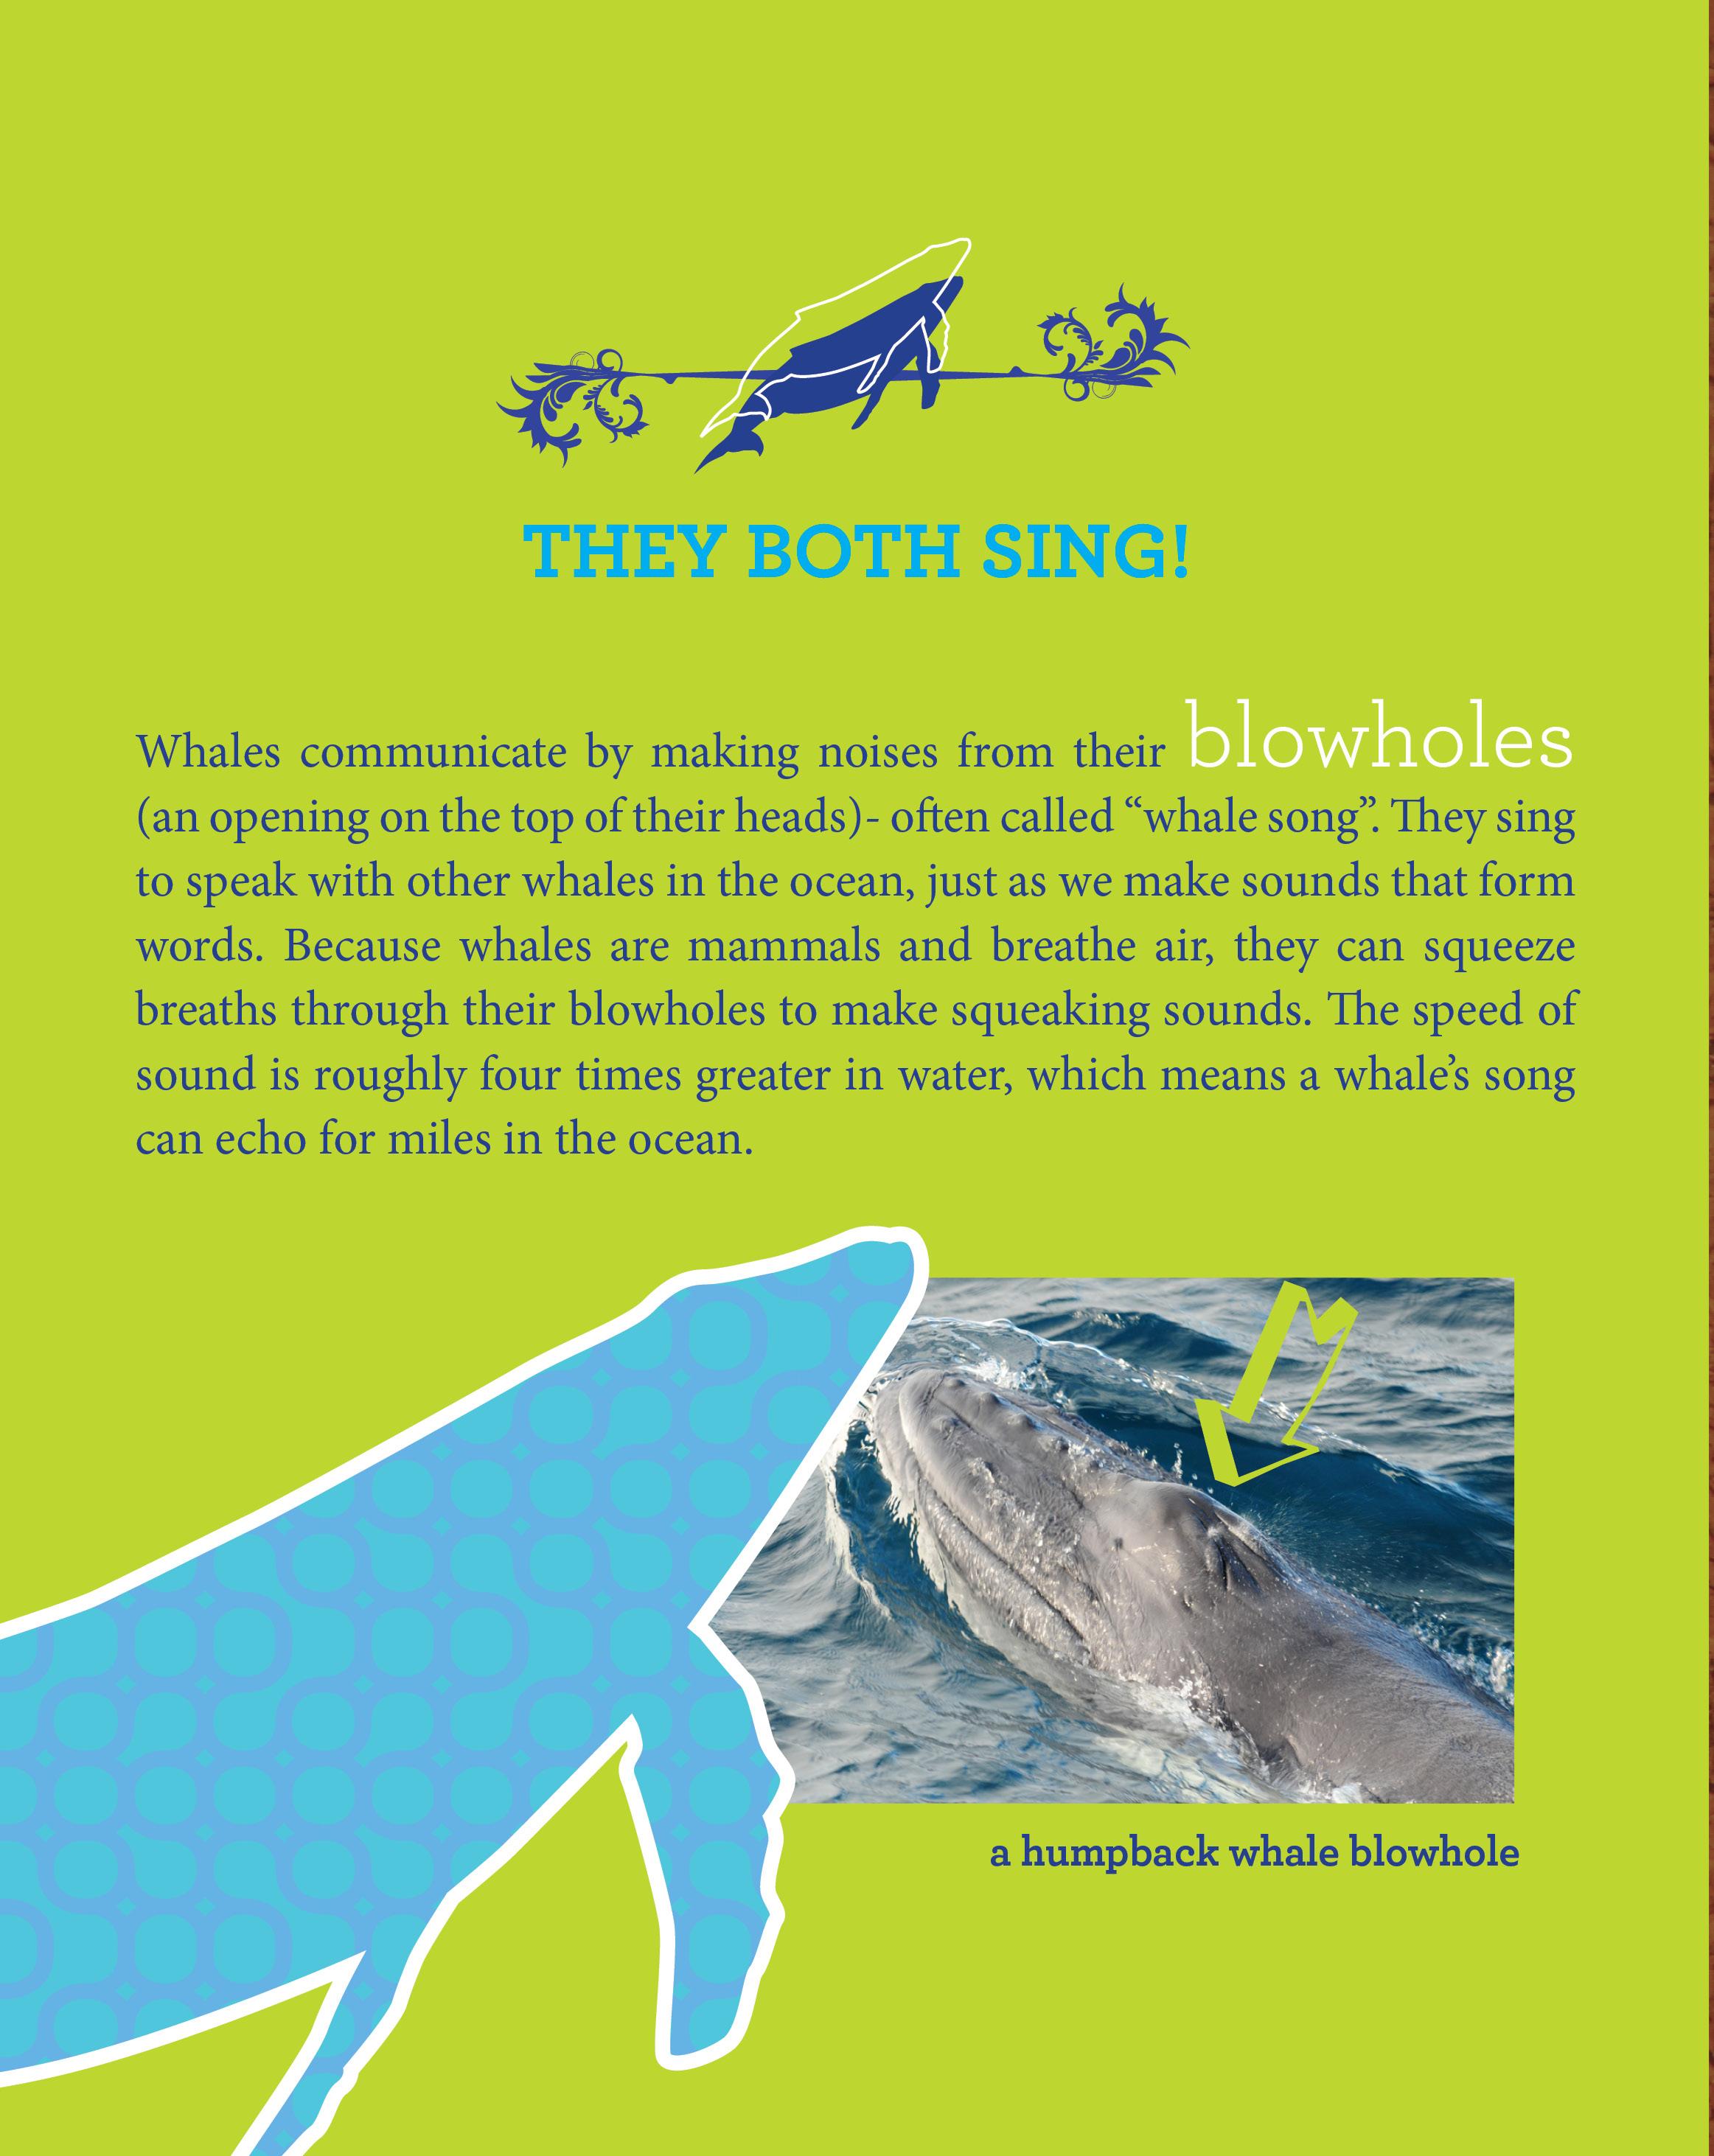 Animals Like Us-whales2.jpg